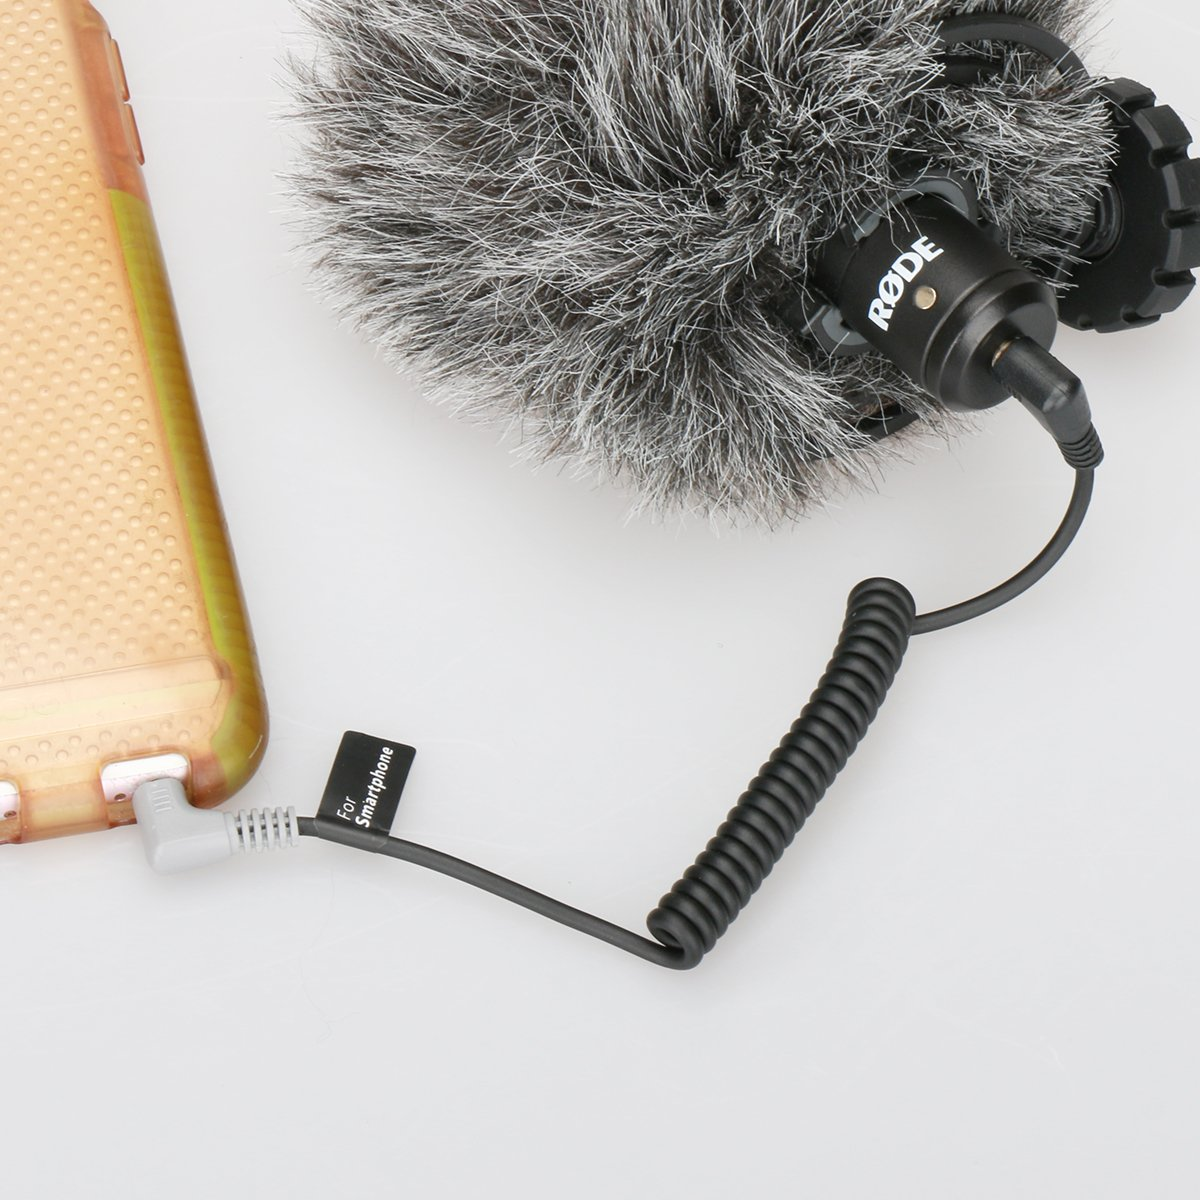 ulanzi TRS de 3,5 mm a TRRS Cable de conexión, Smartphone ...